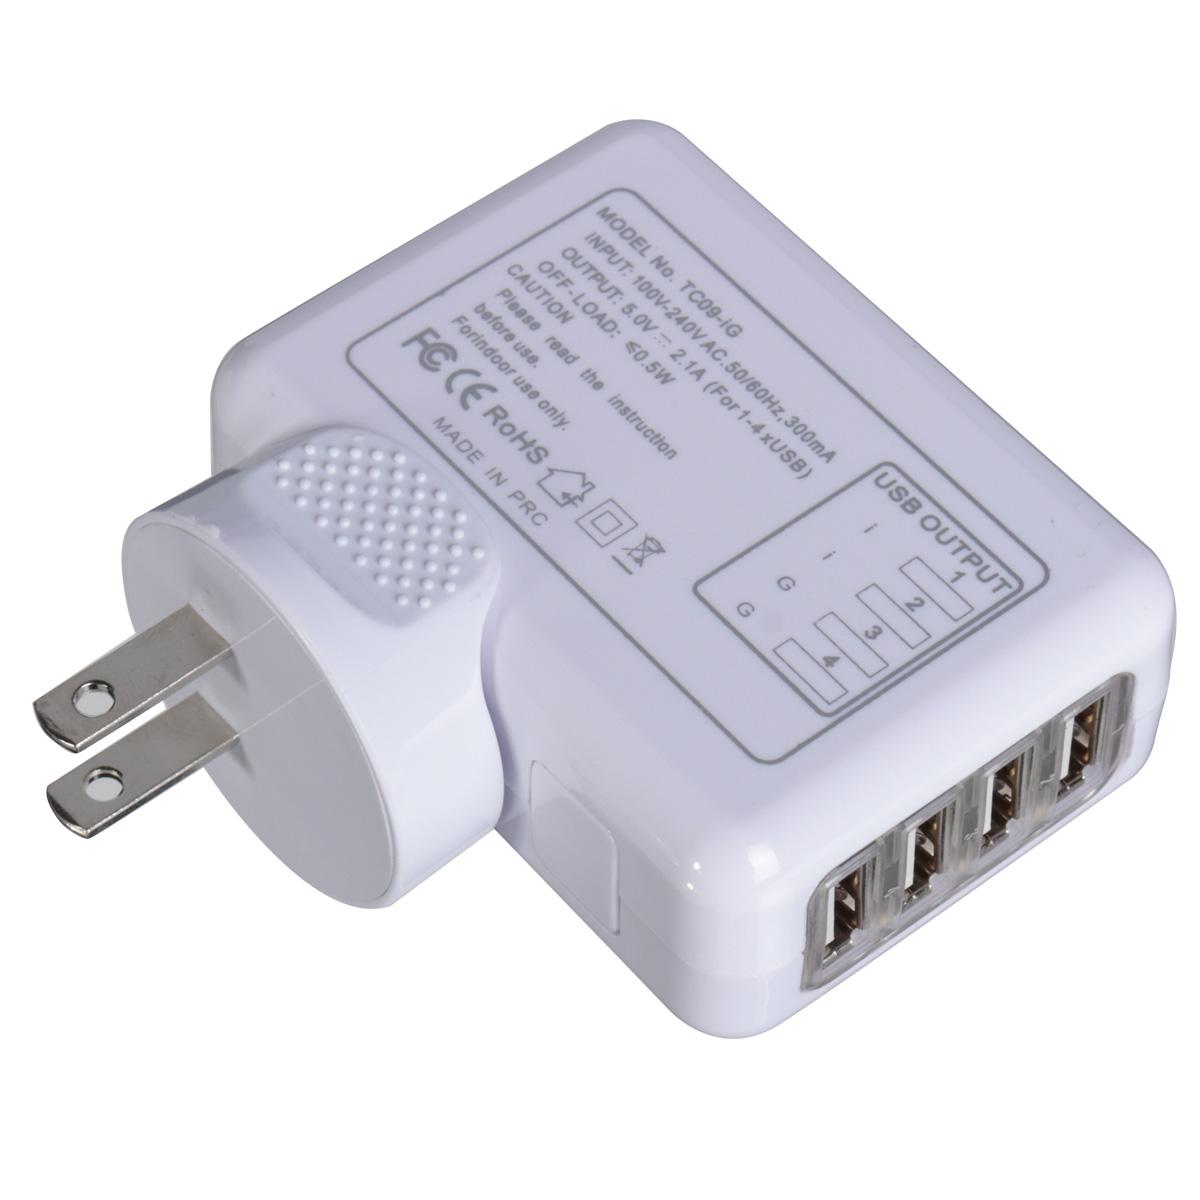 4 6 port usb ac multi adapter us eu uk au plug wall charger portable home travel ebay - Multi chargeur usb ...